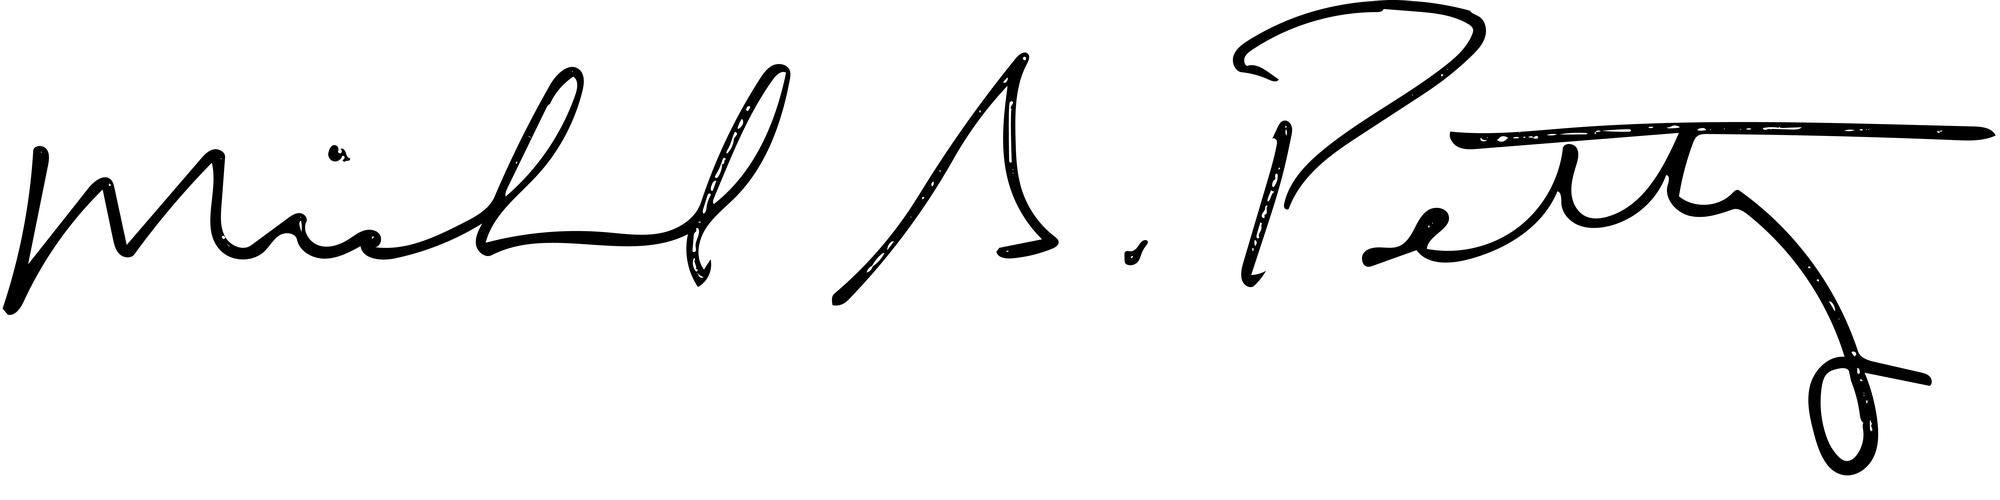 Michael S. Petty signature